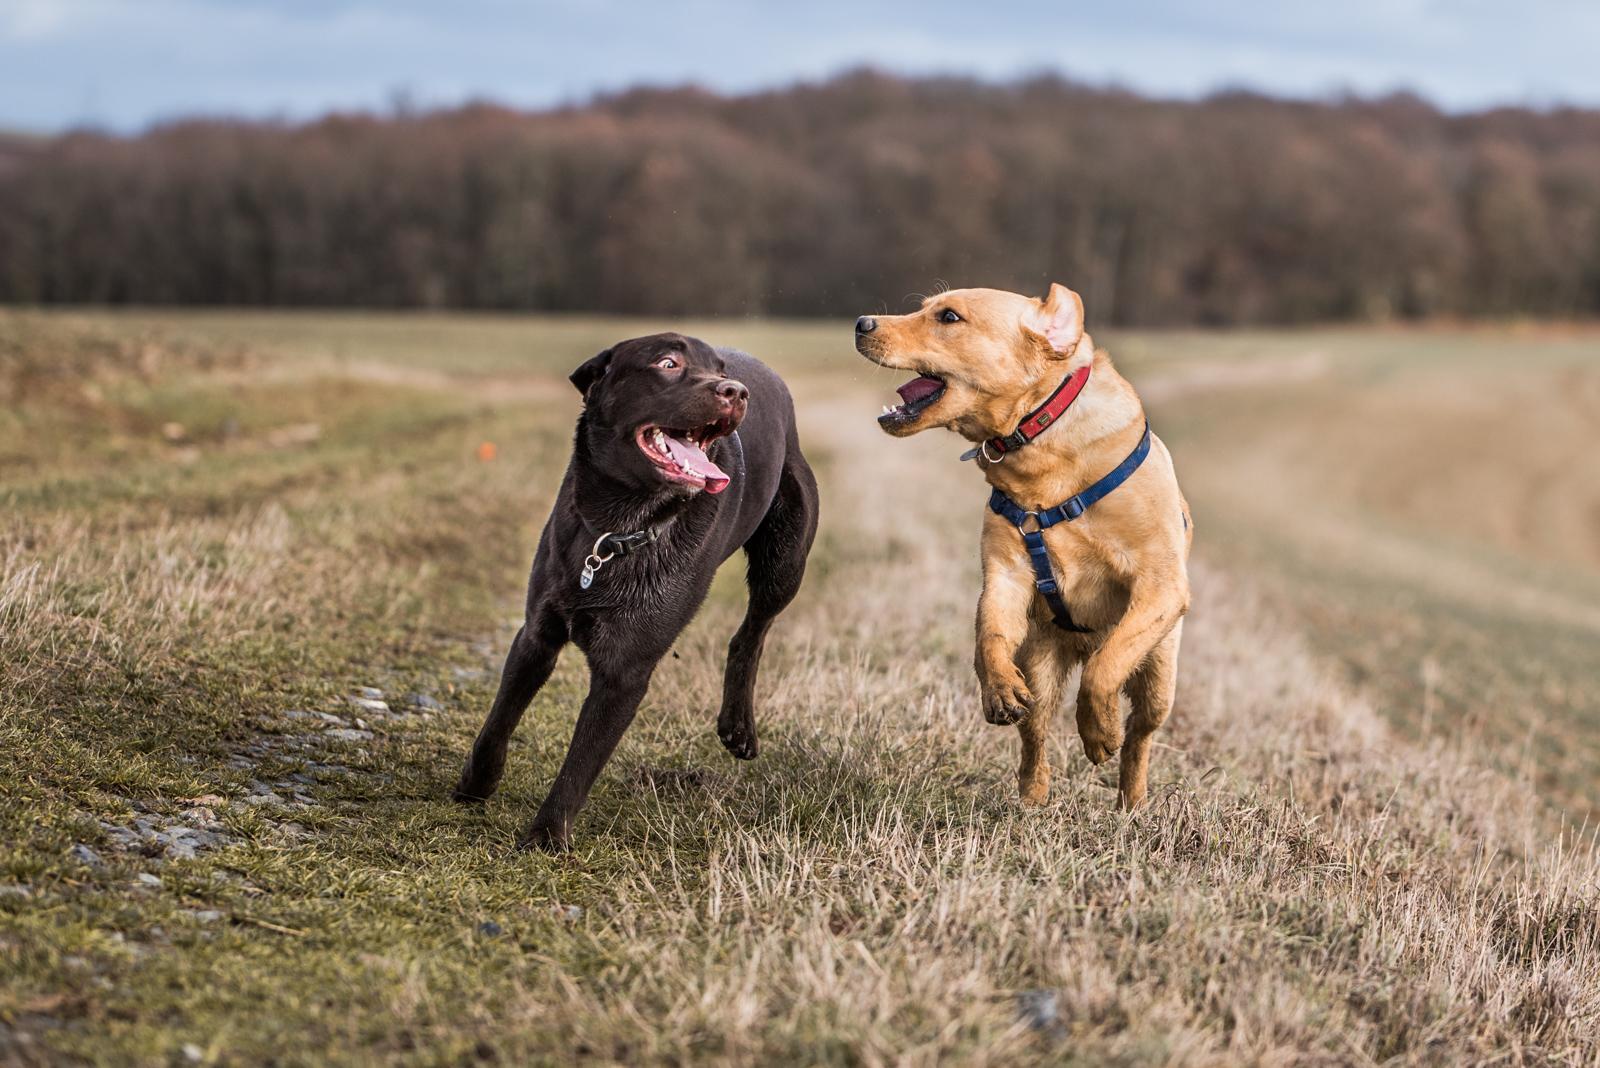 Tierfotograf-Labrador-Sven's Bildwerke-Hund-Hundefotografie12